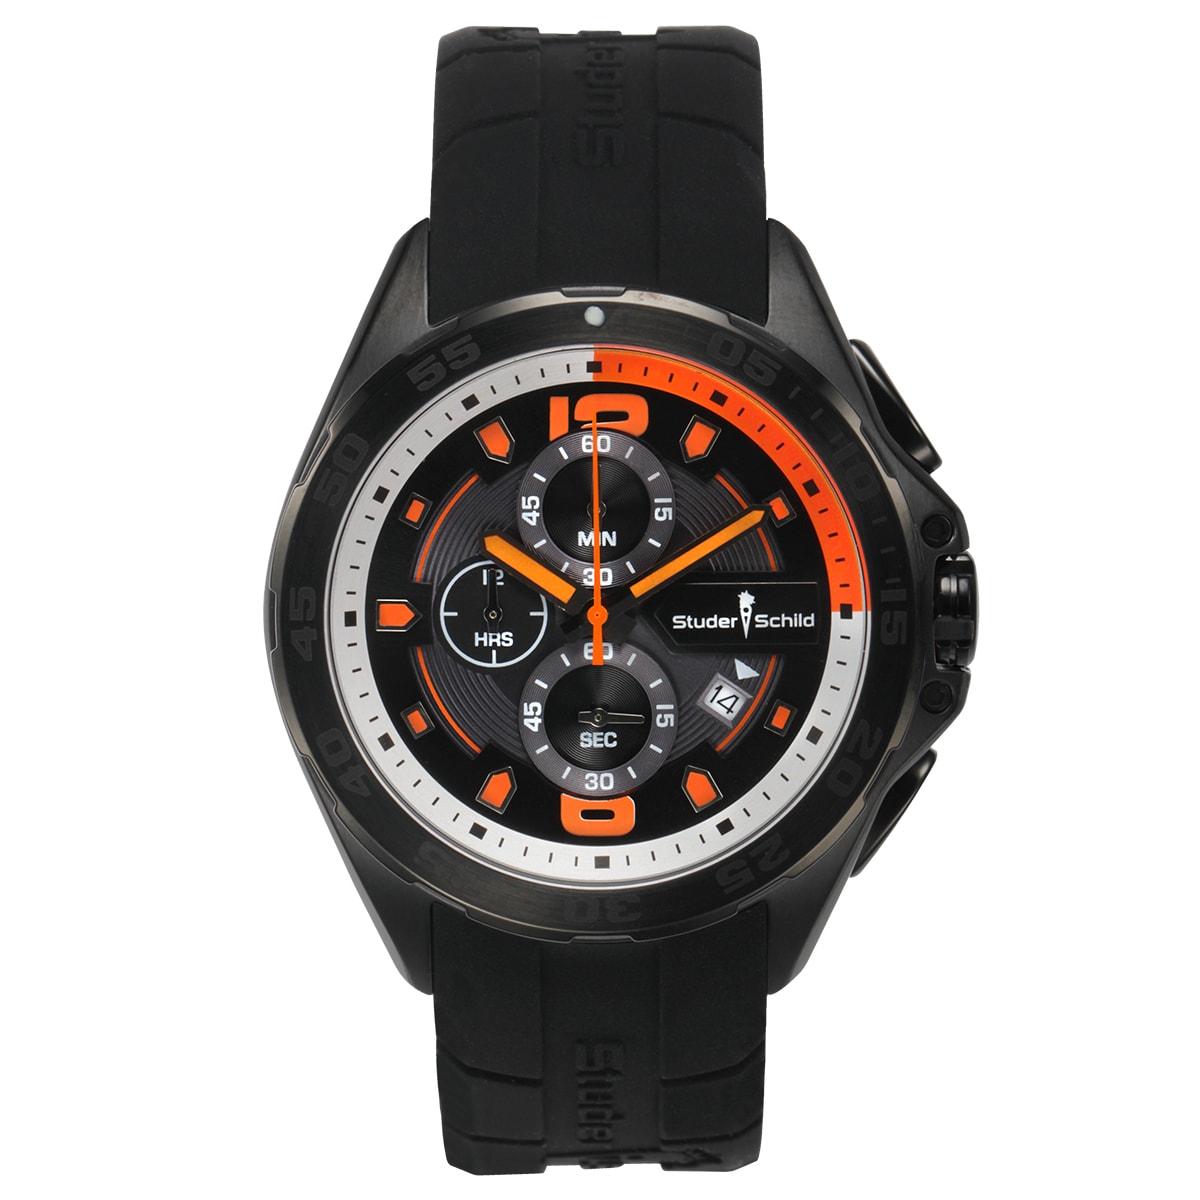 Citizen Studer Schild Cantor Chronograph Men's Watch Quar...